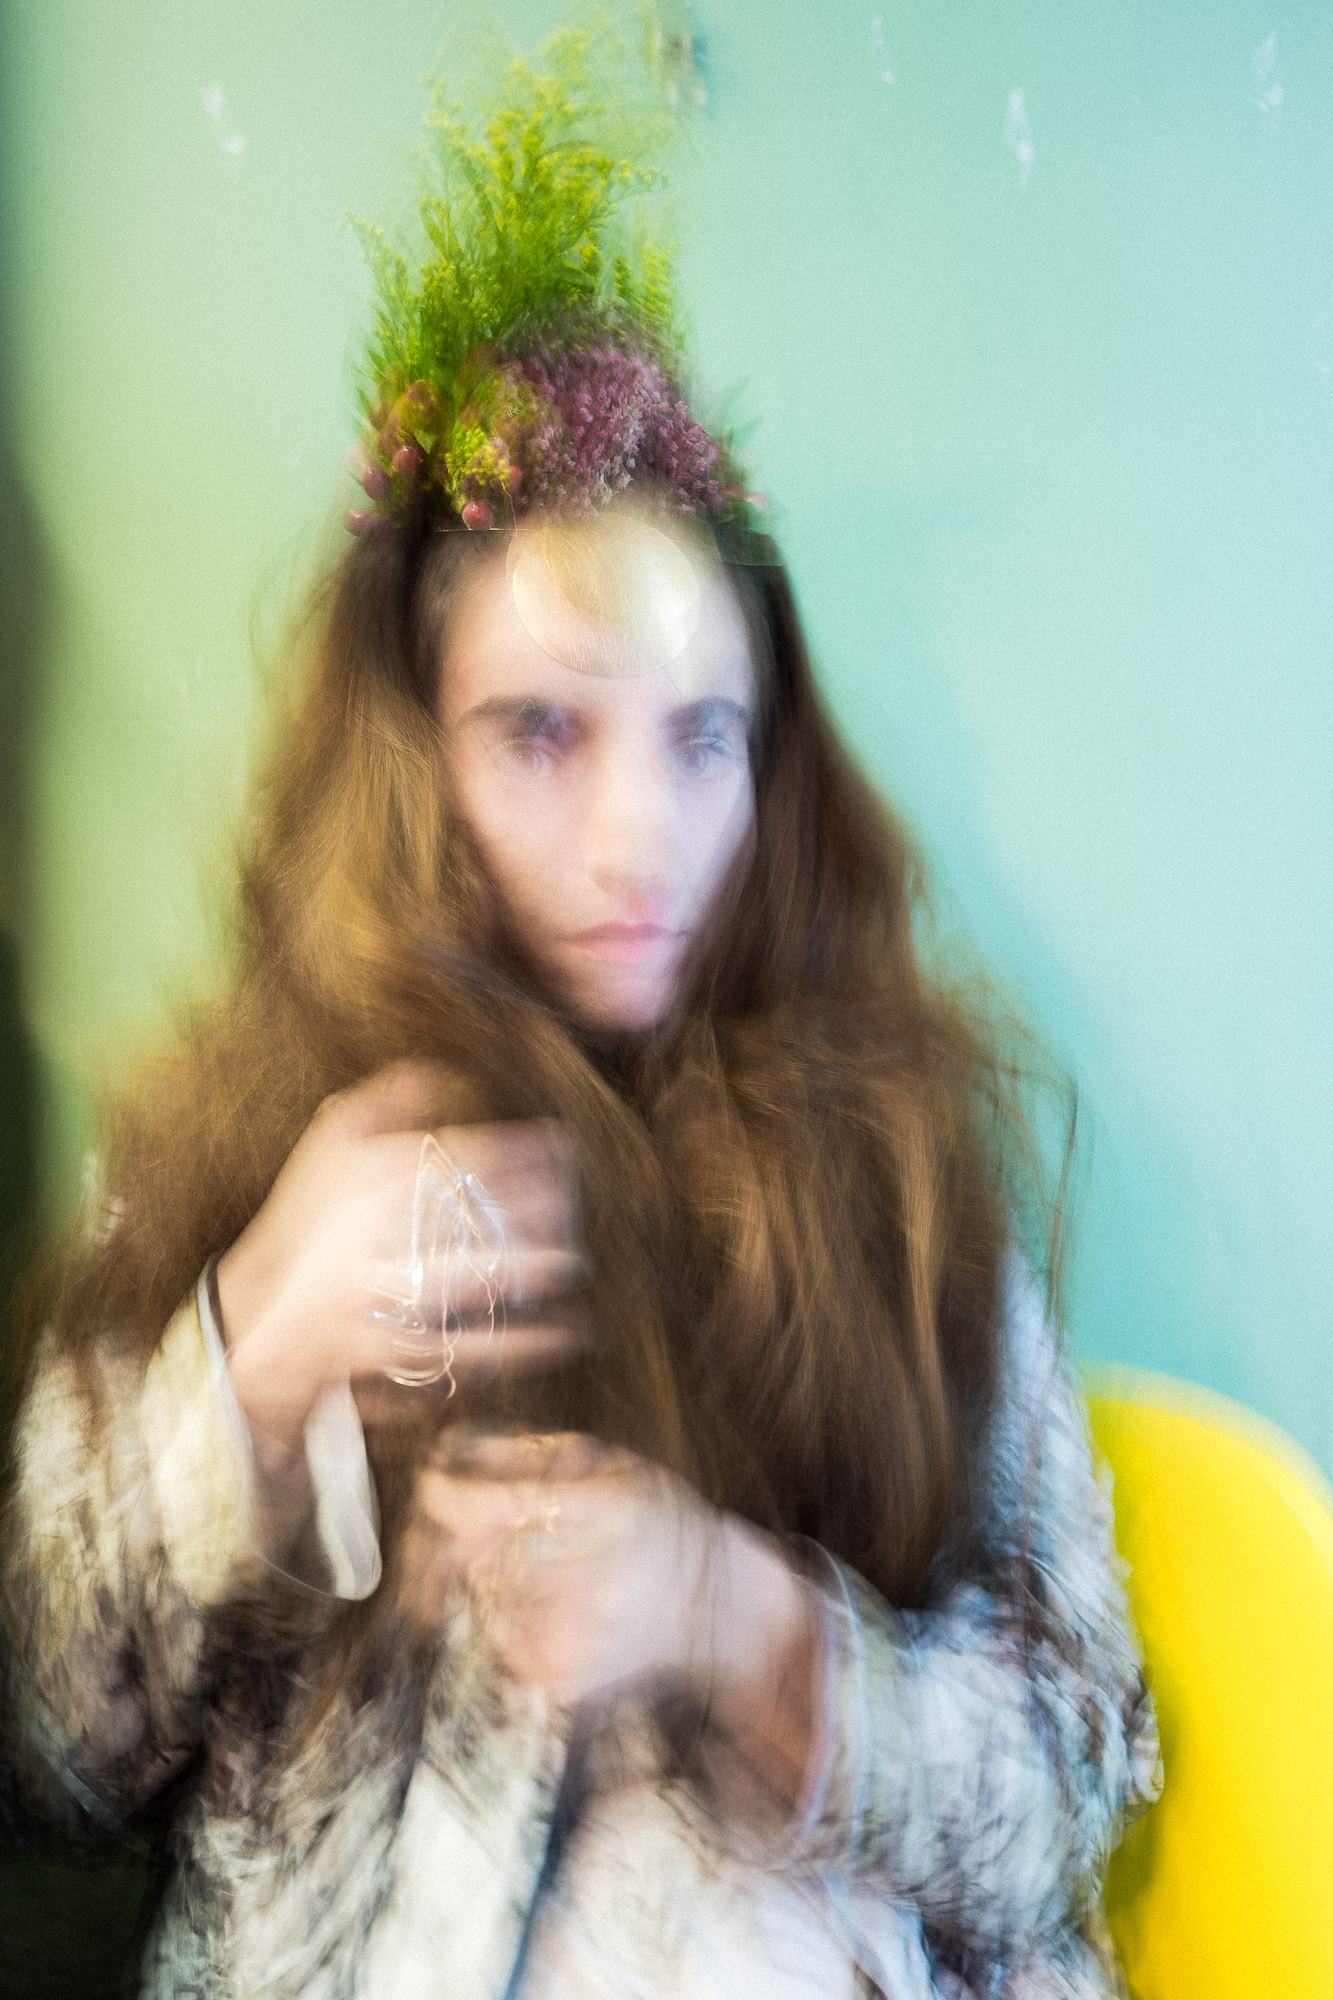 Sarah P. - Photo by Christoph Neumann